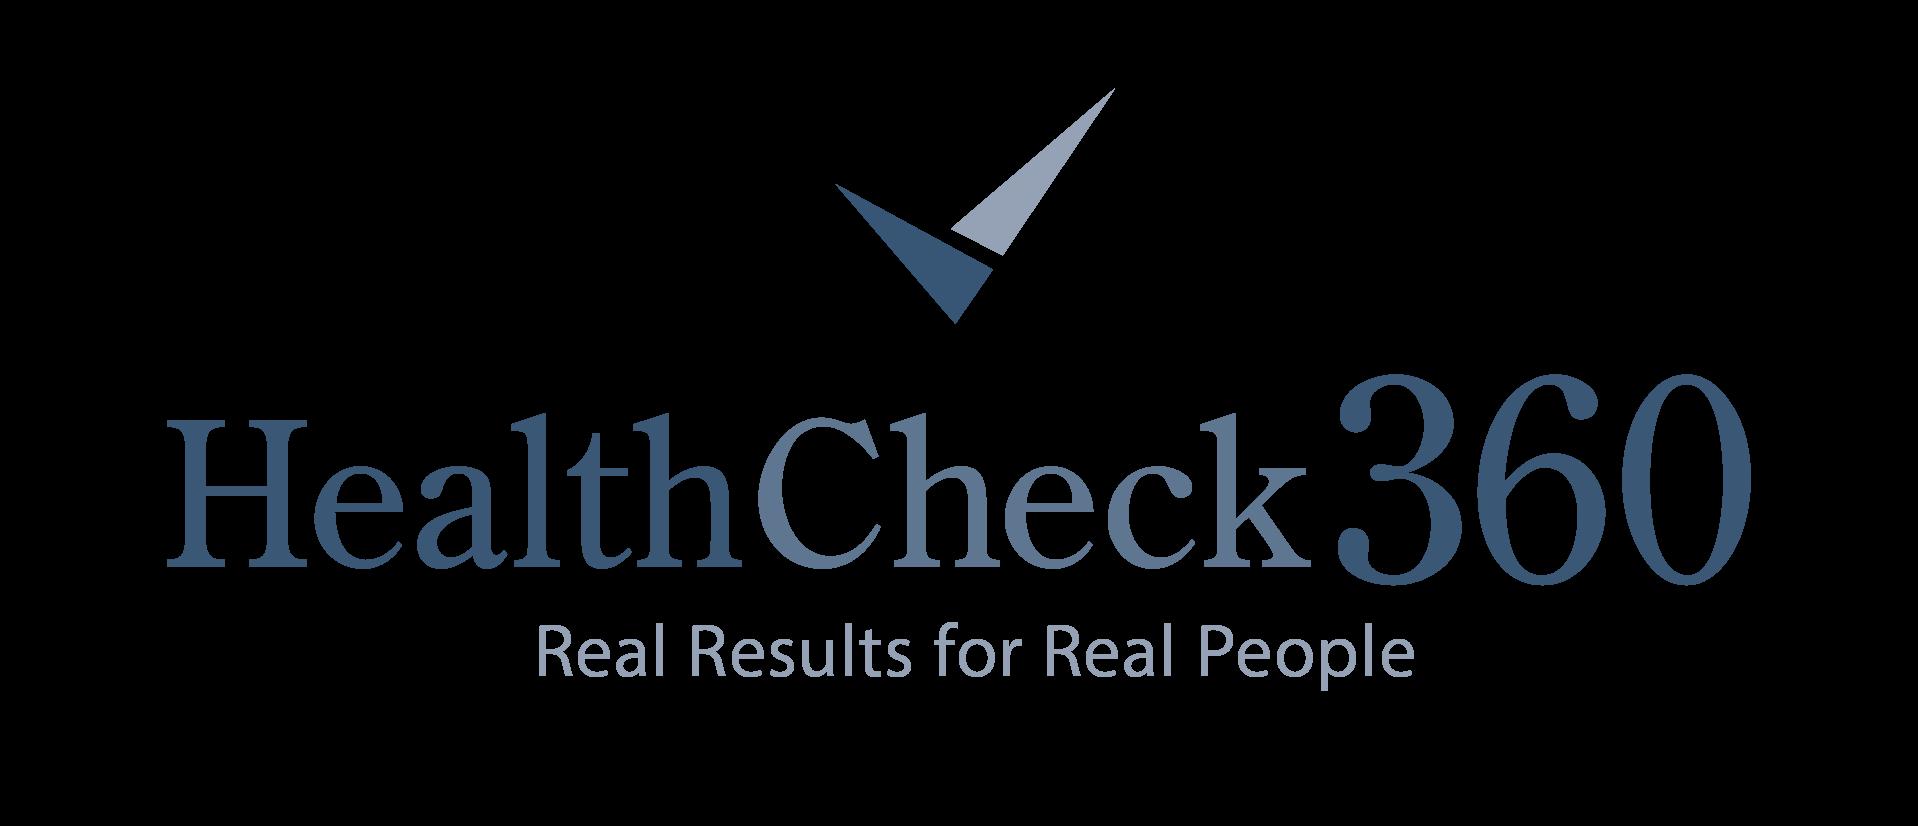 HealthCheck360 Reviews | HealthCheck360 information | Shortlister